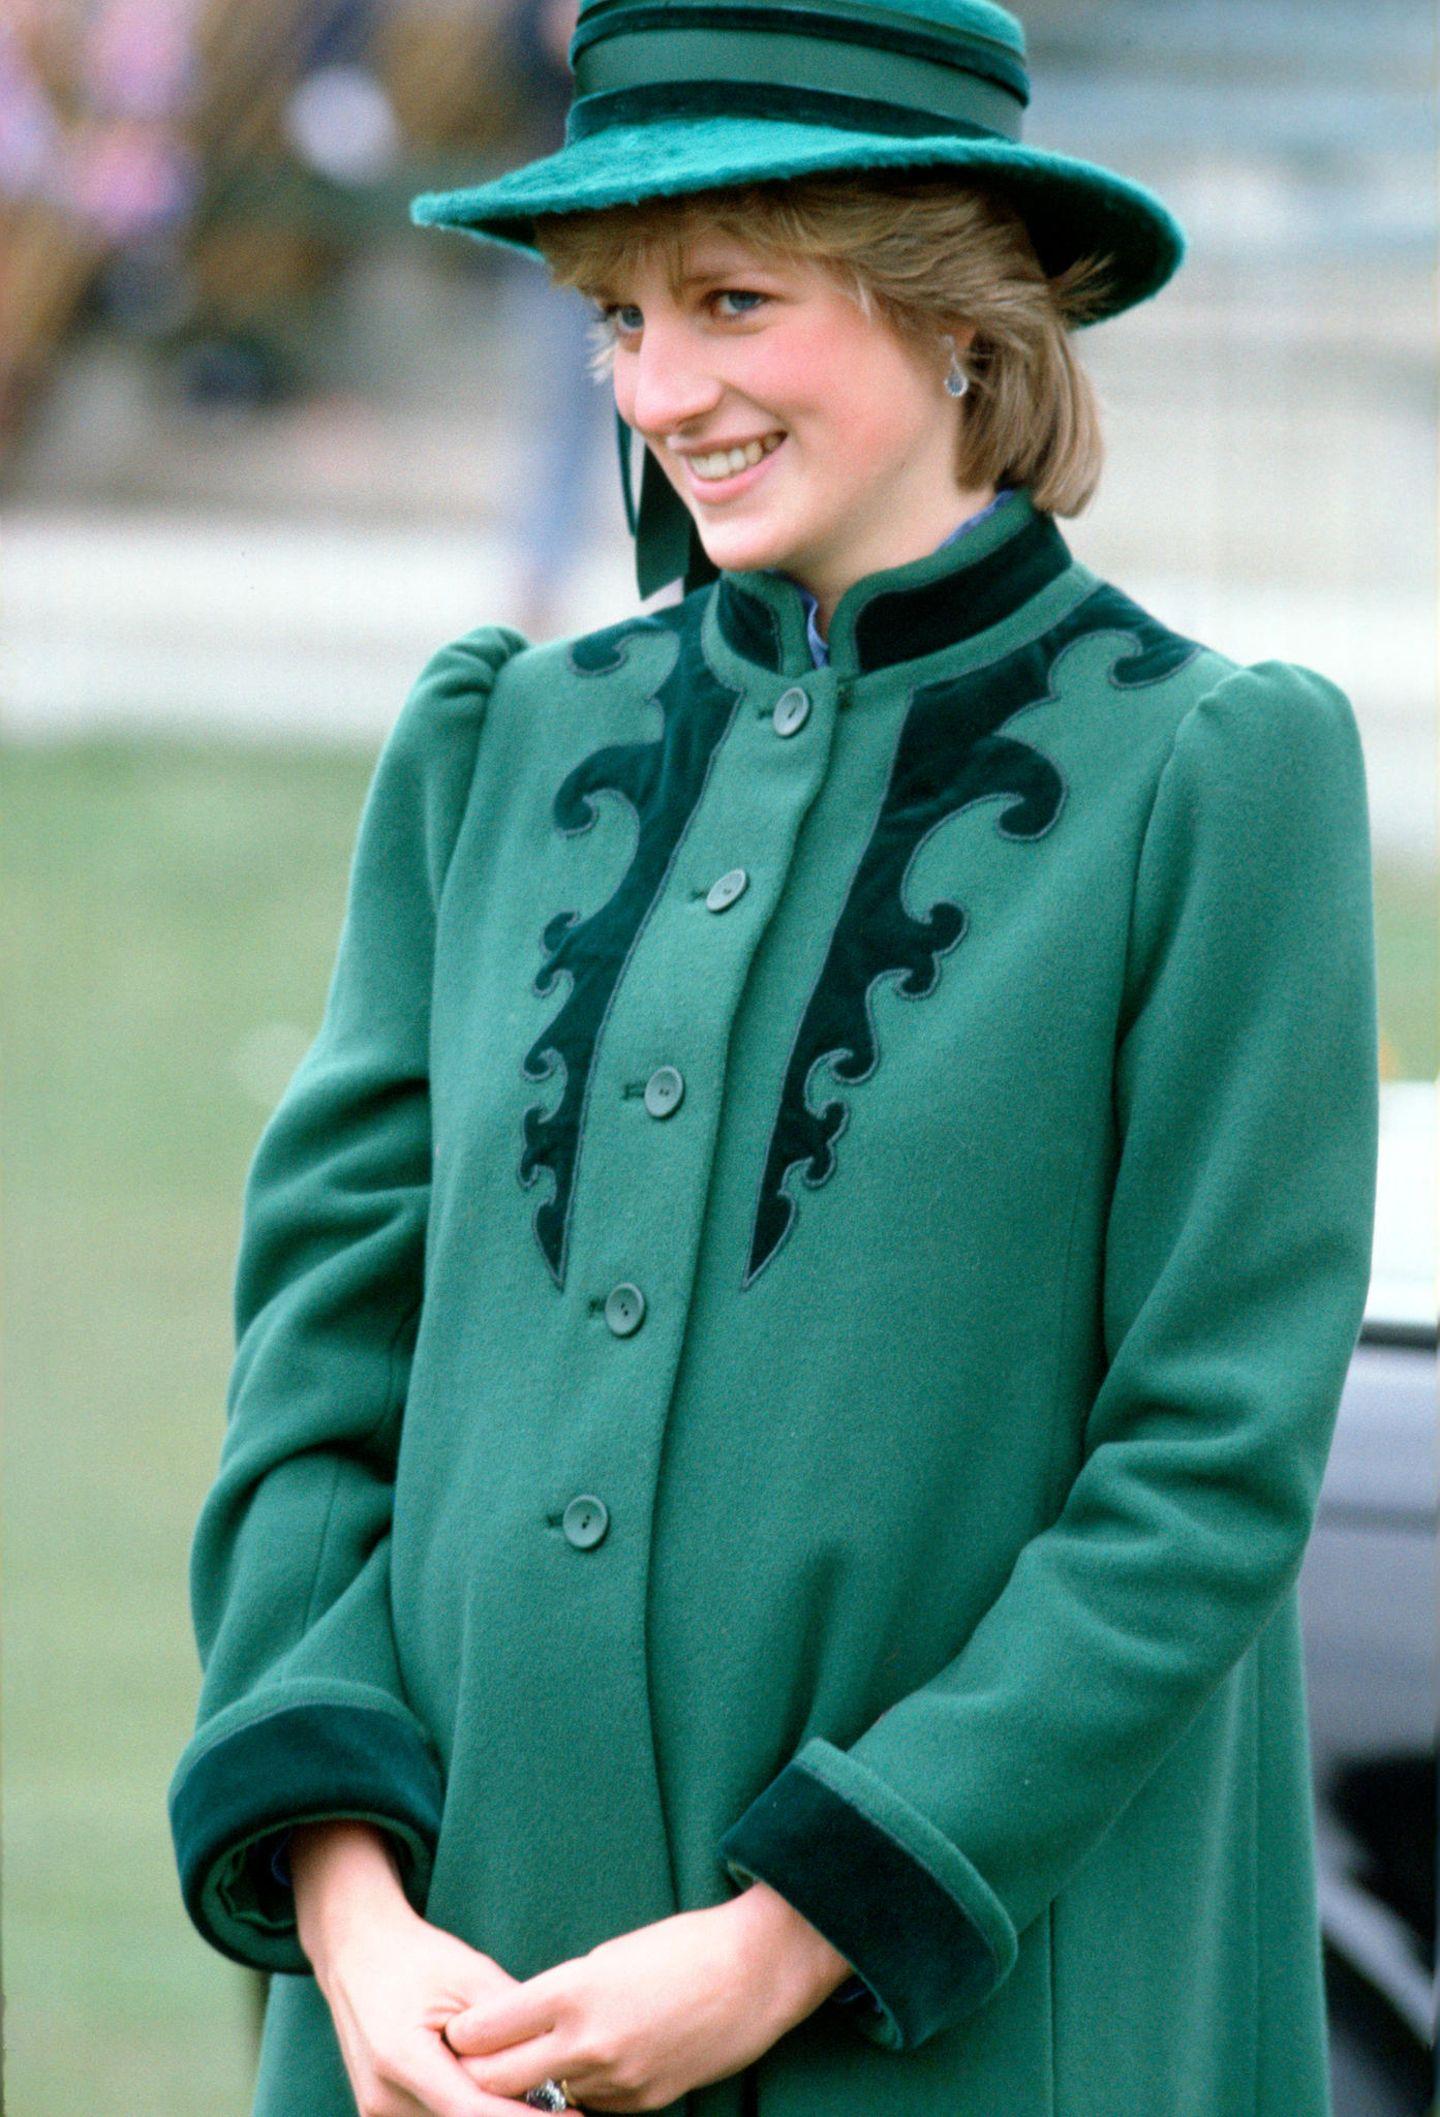 Lady Dianas Looks: Prinzessin Diana mit grünem Mantel und Hut